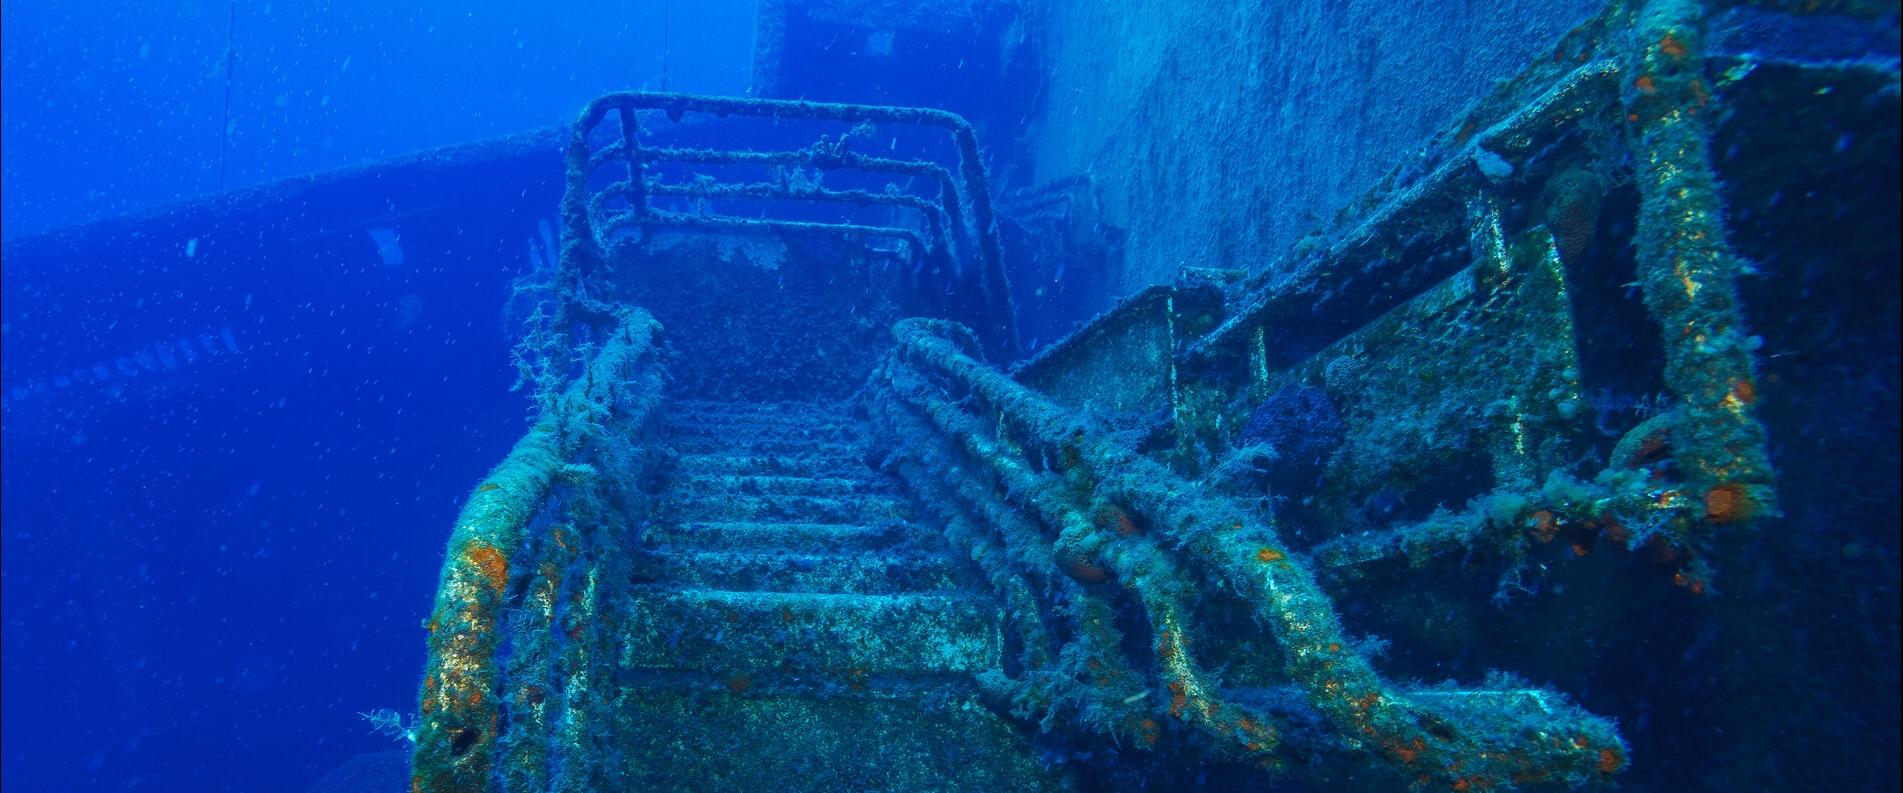 Diving Zenobia Ship Wreck